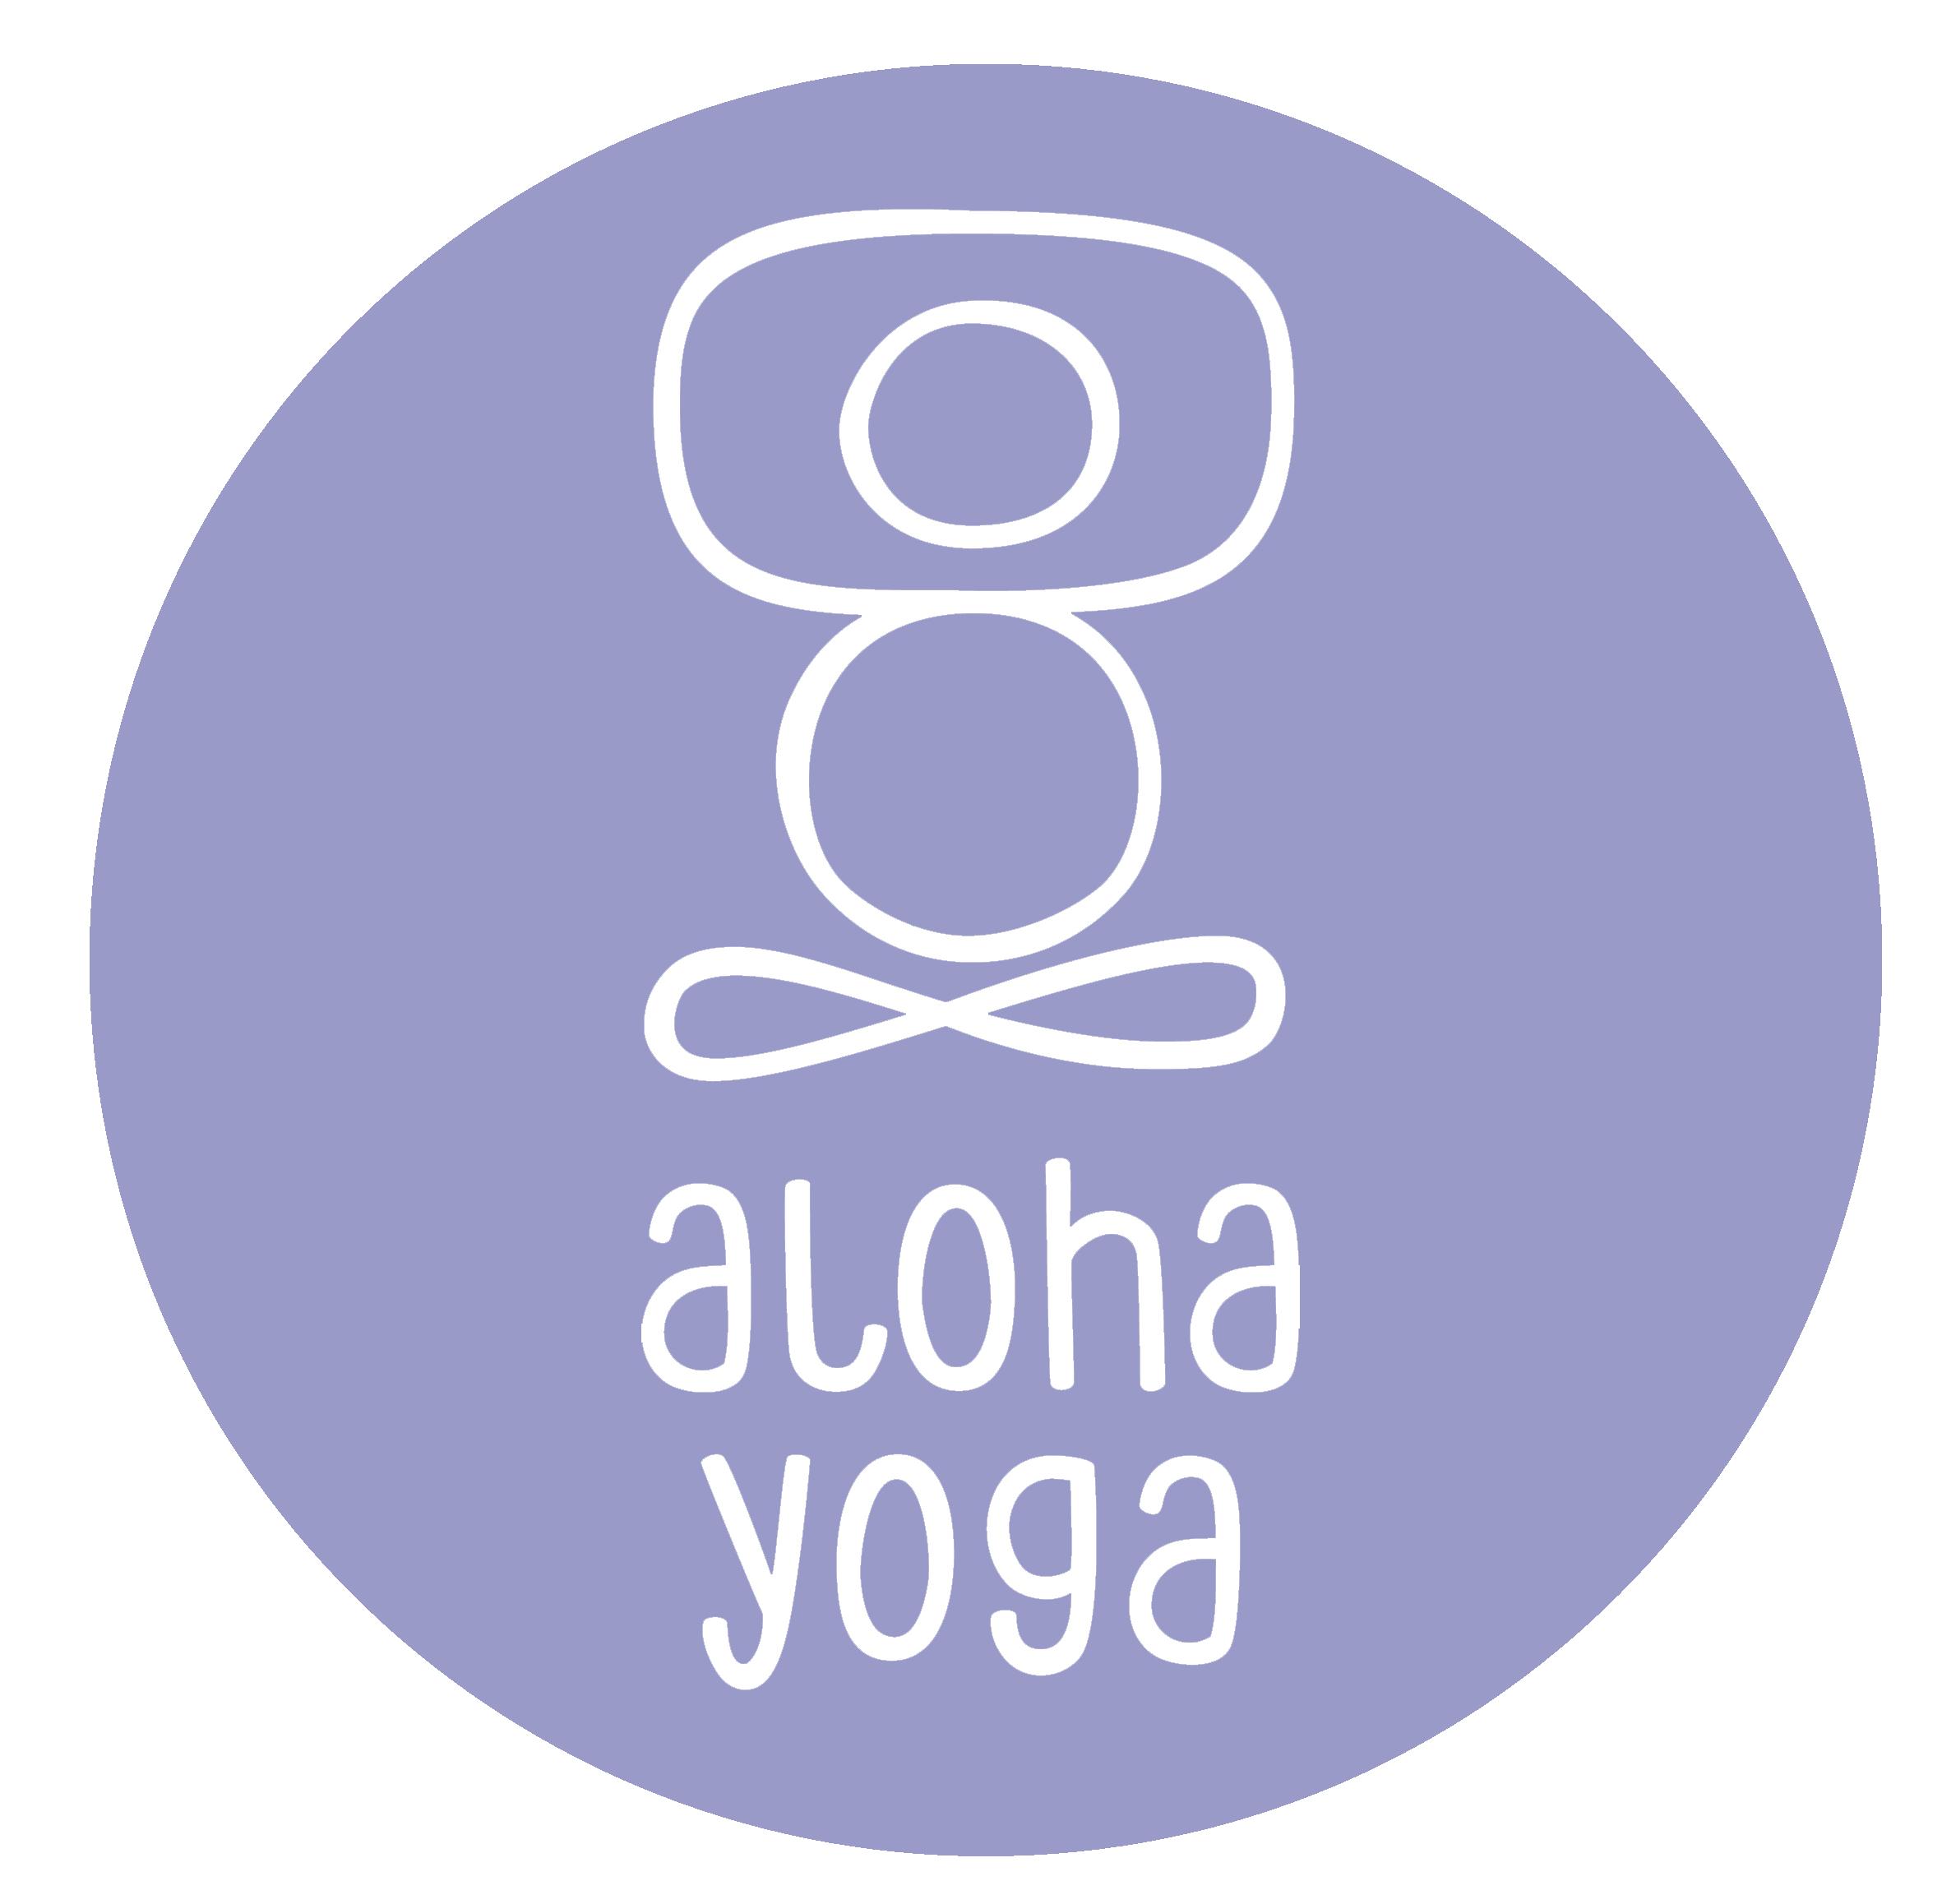 aloha yoga